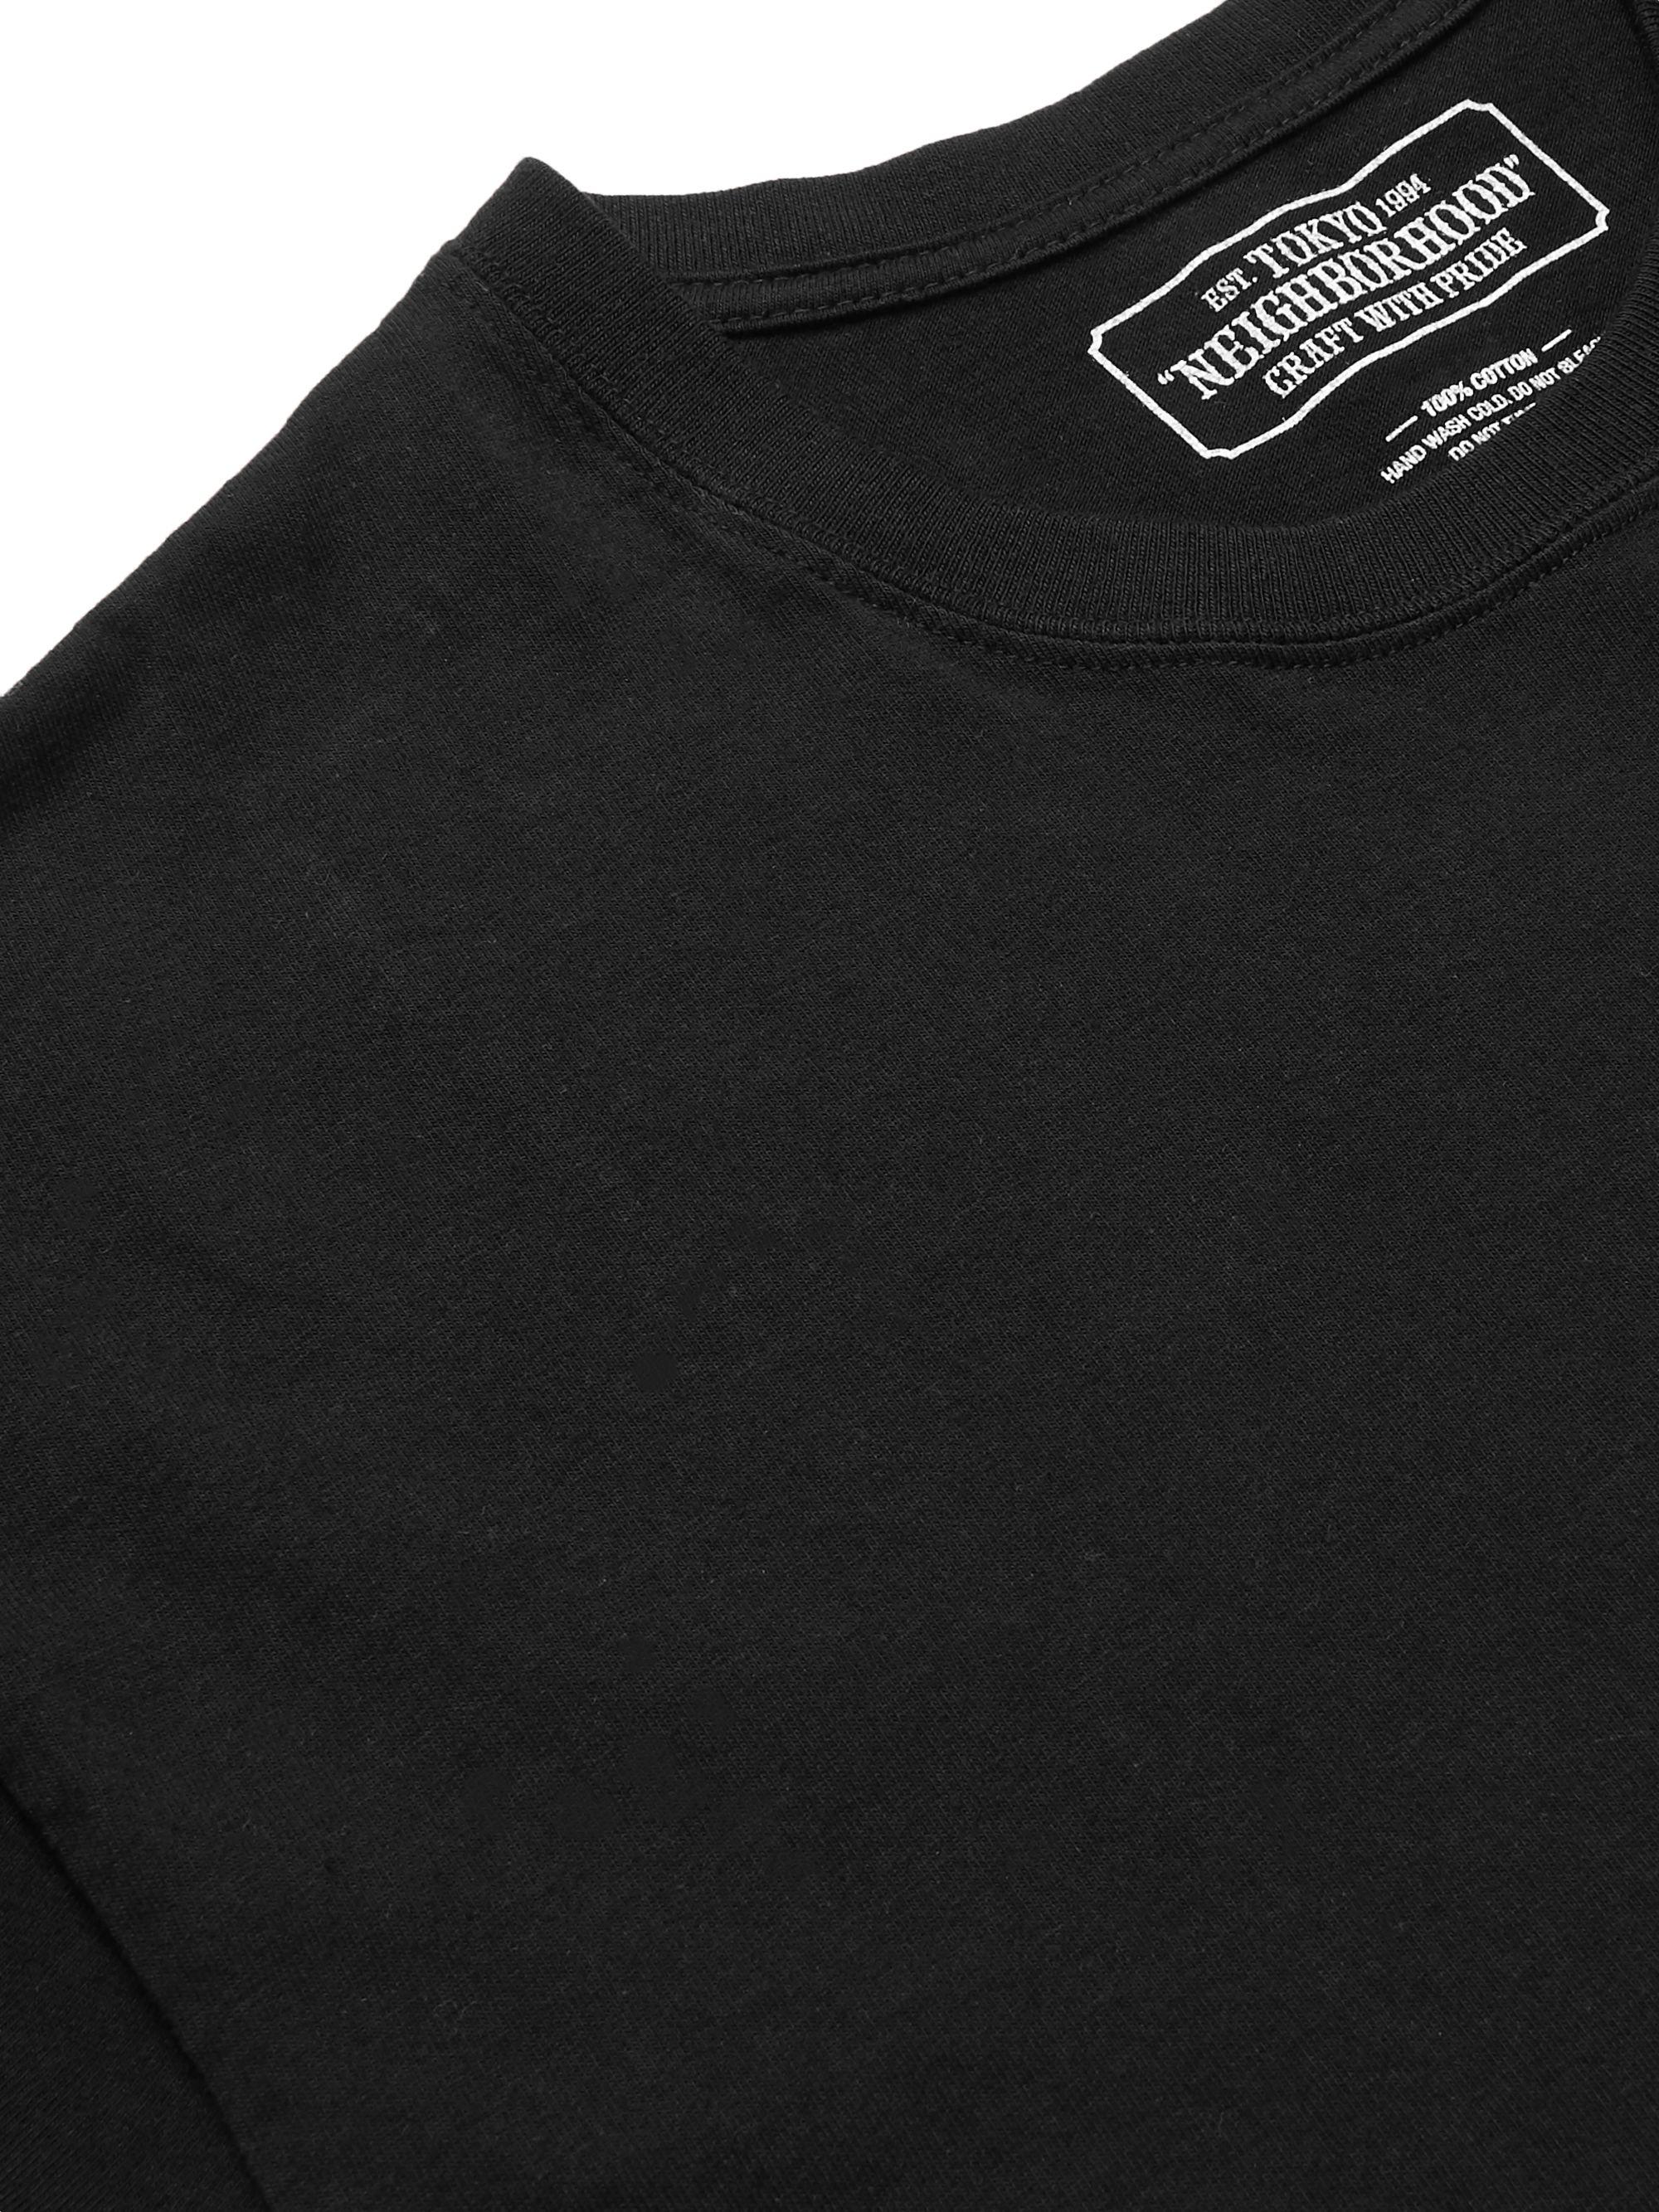 Black + Mr Cartoon Printed Cotton-jersey T-shirt | Neighborhood